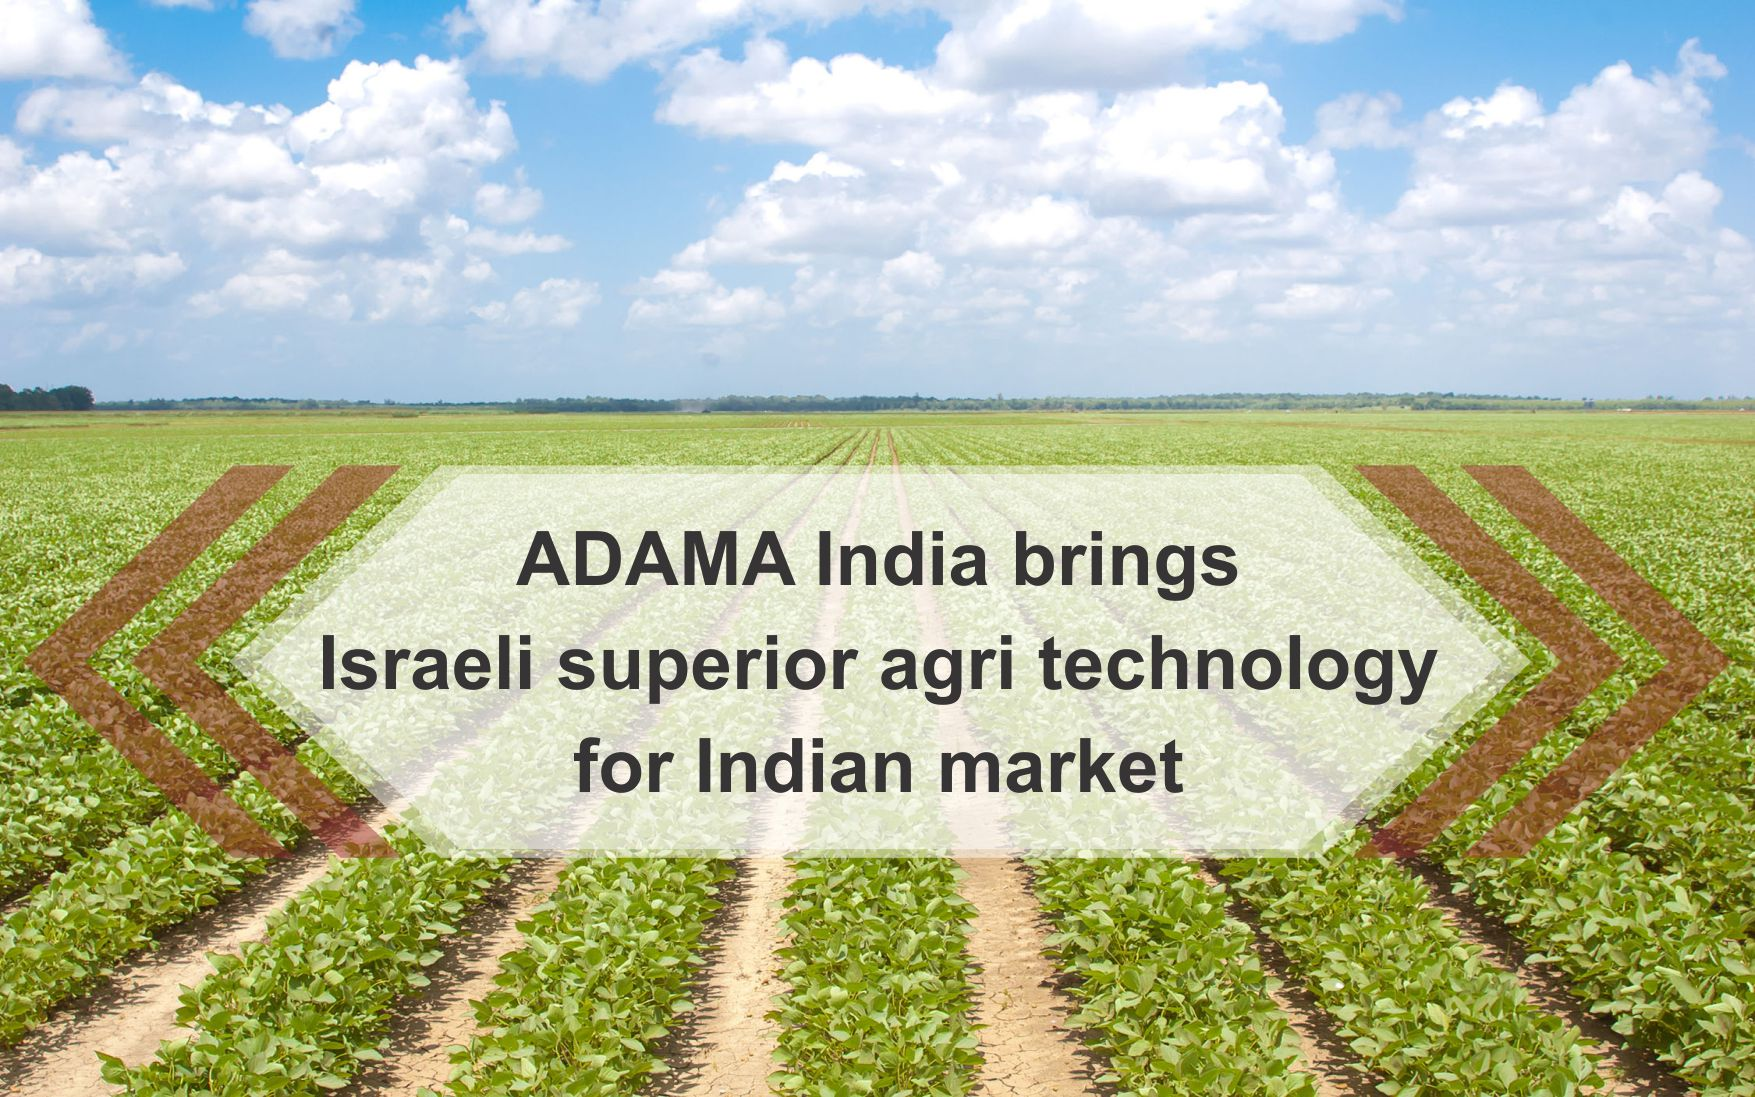 ADAMA India brings Israeli superior agri technology for Indian